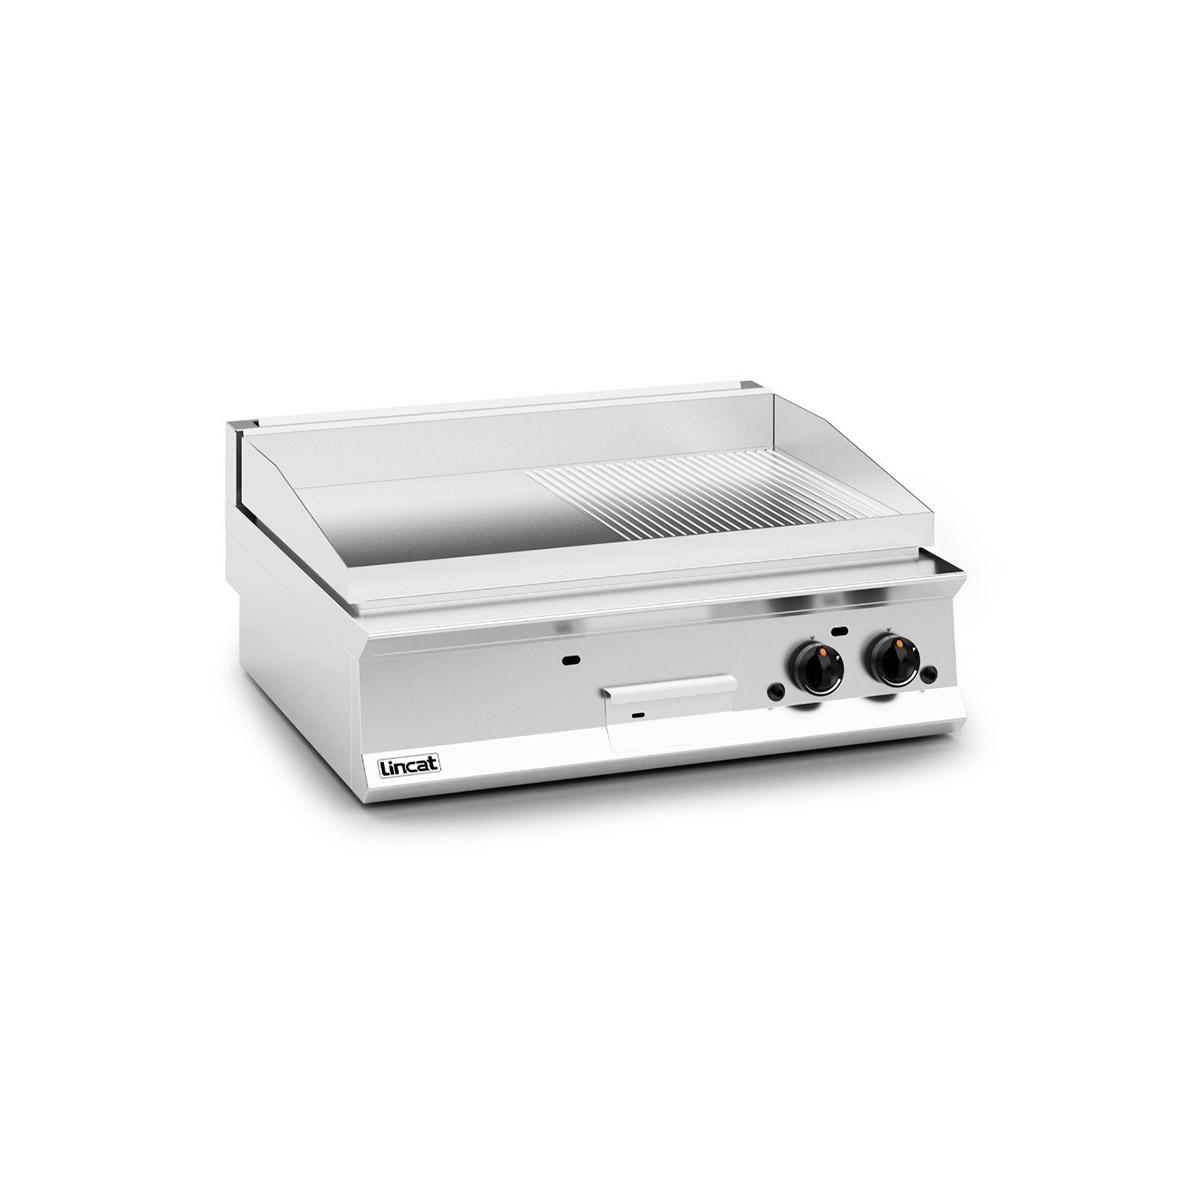 Lincat Opus 800 Chrome Plate Gas Griddle Model: OG8202/C/P (Propane)